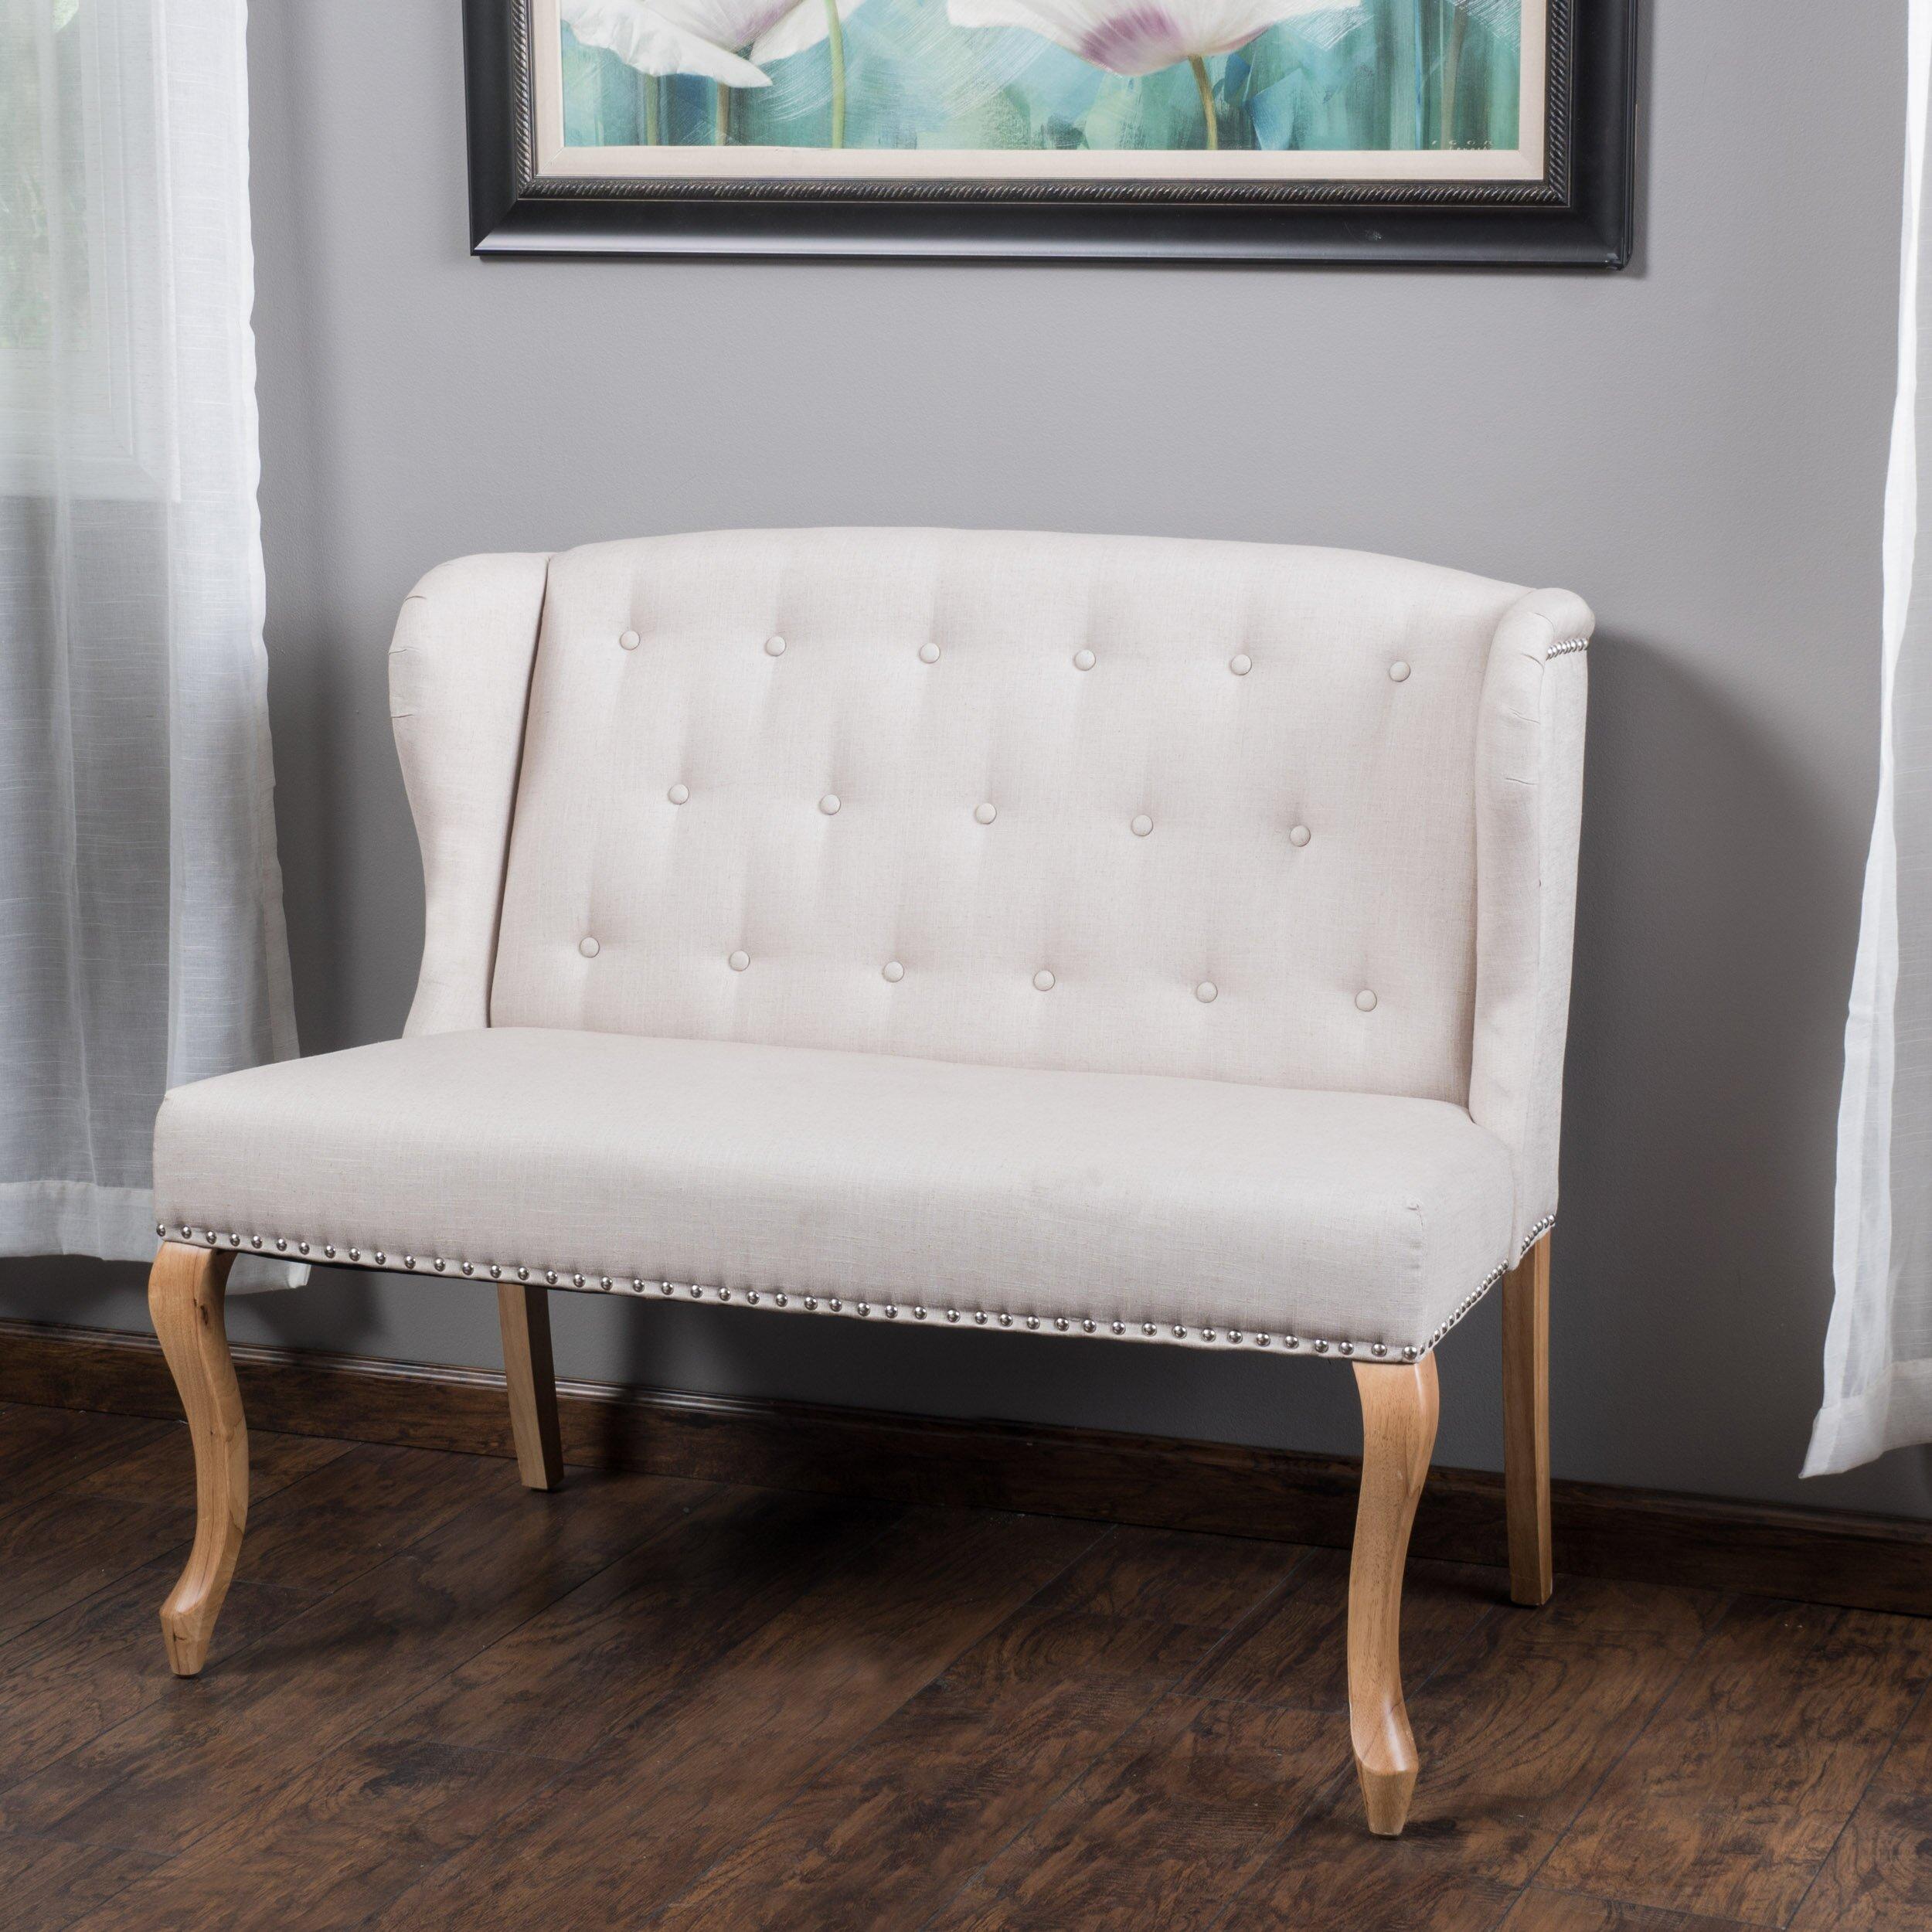 Lark Manor Guyette Upholstered Bedroom Bench Reviews Wayfair